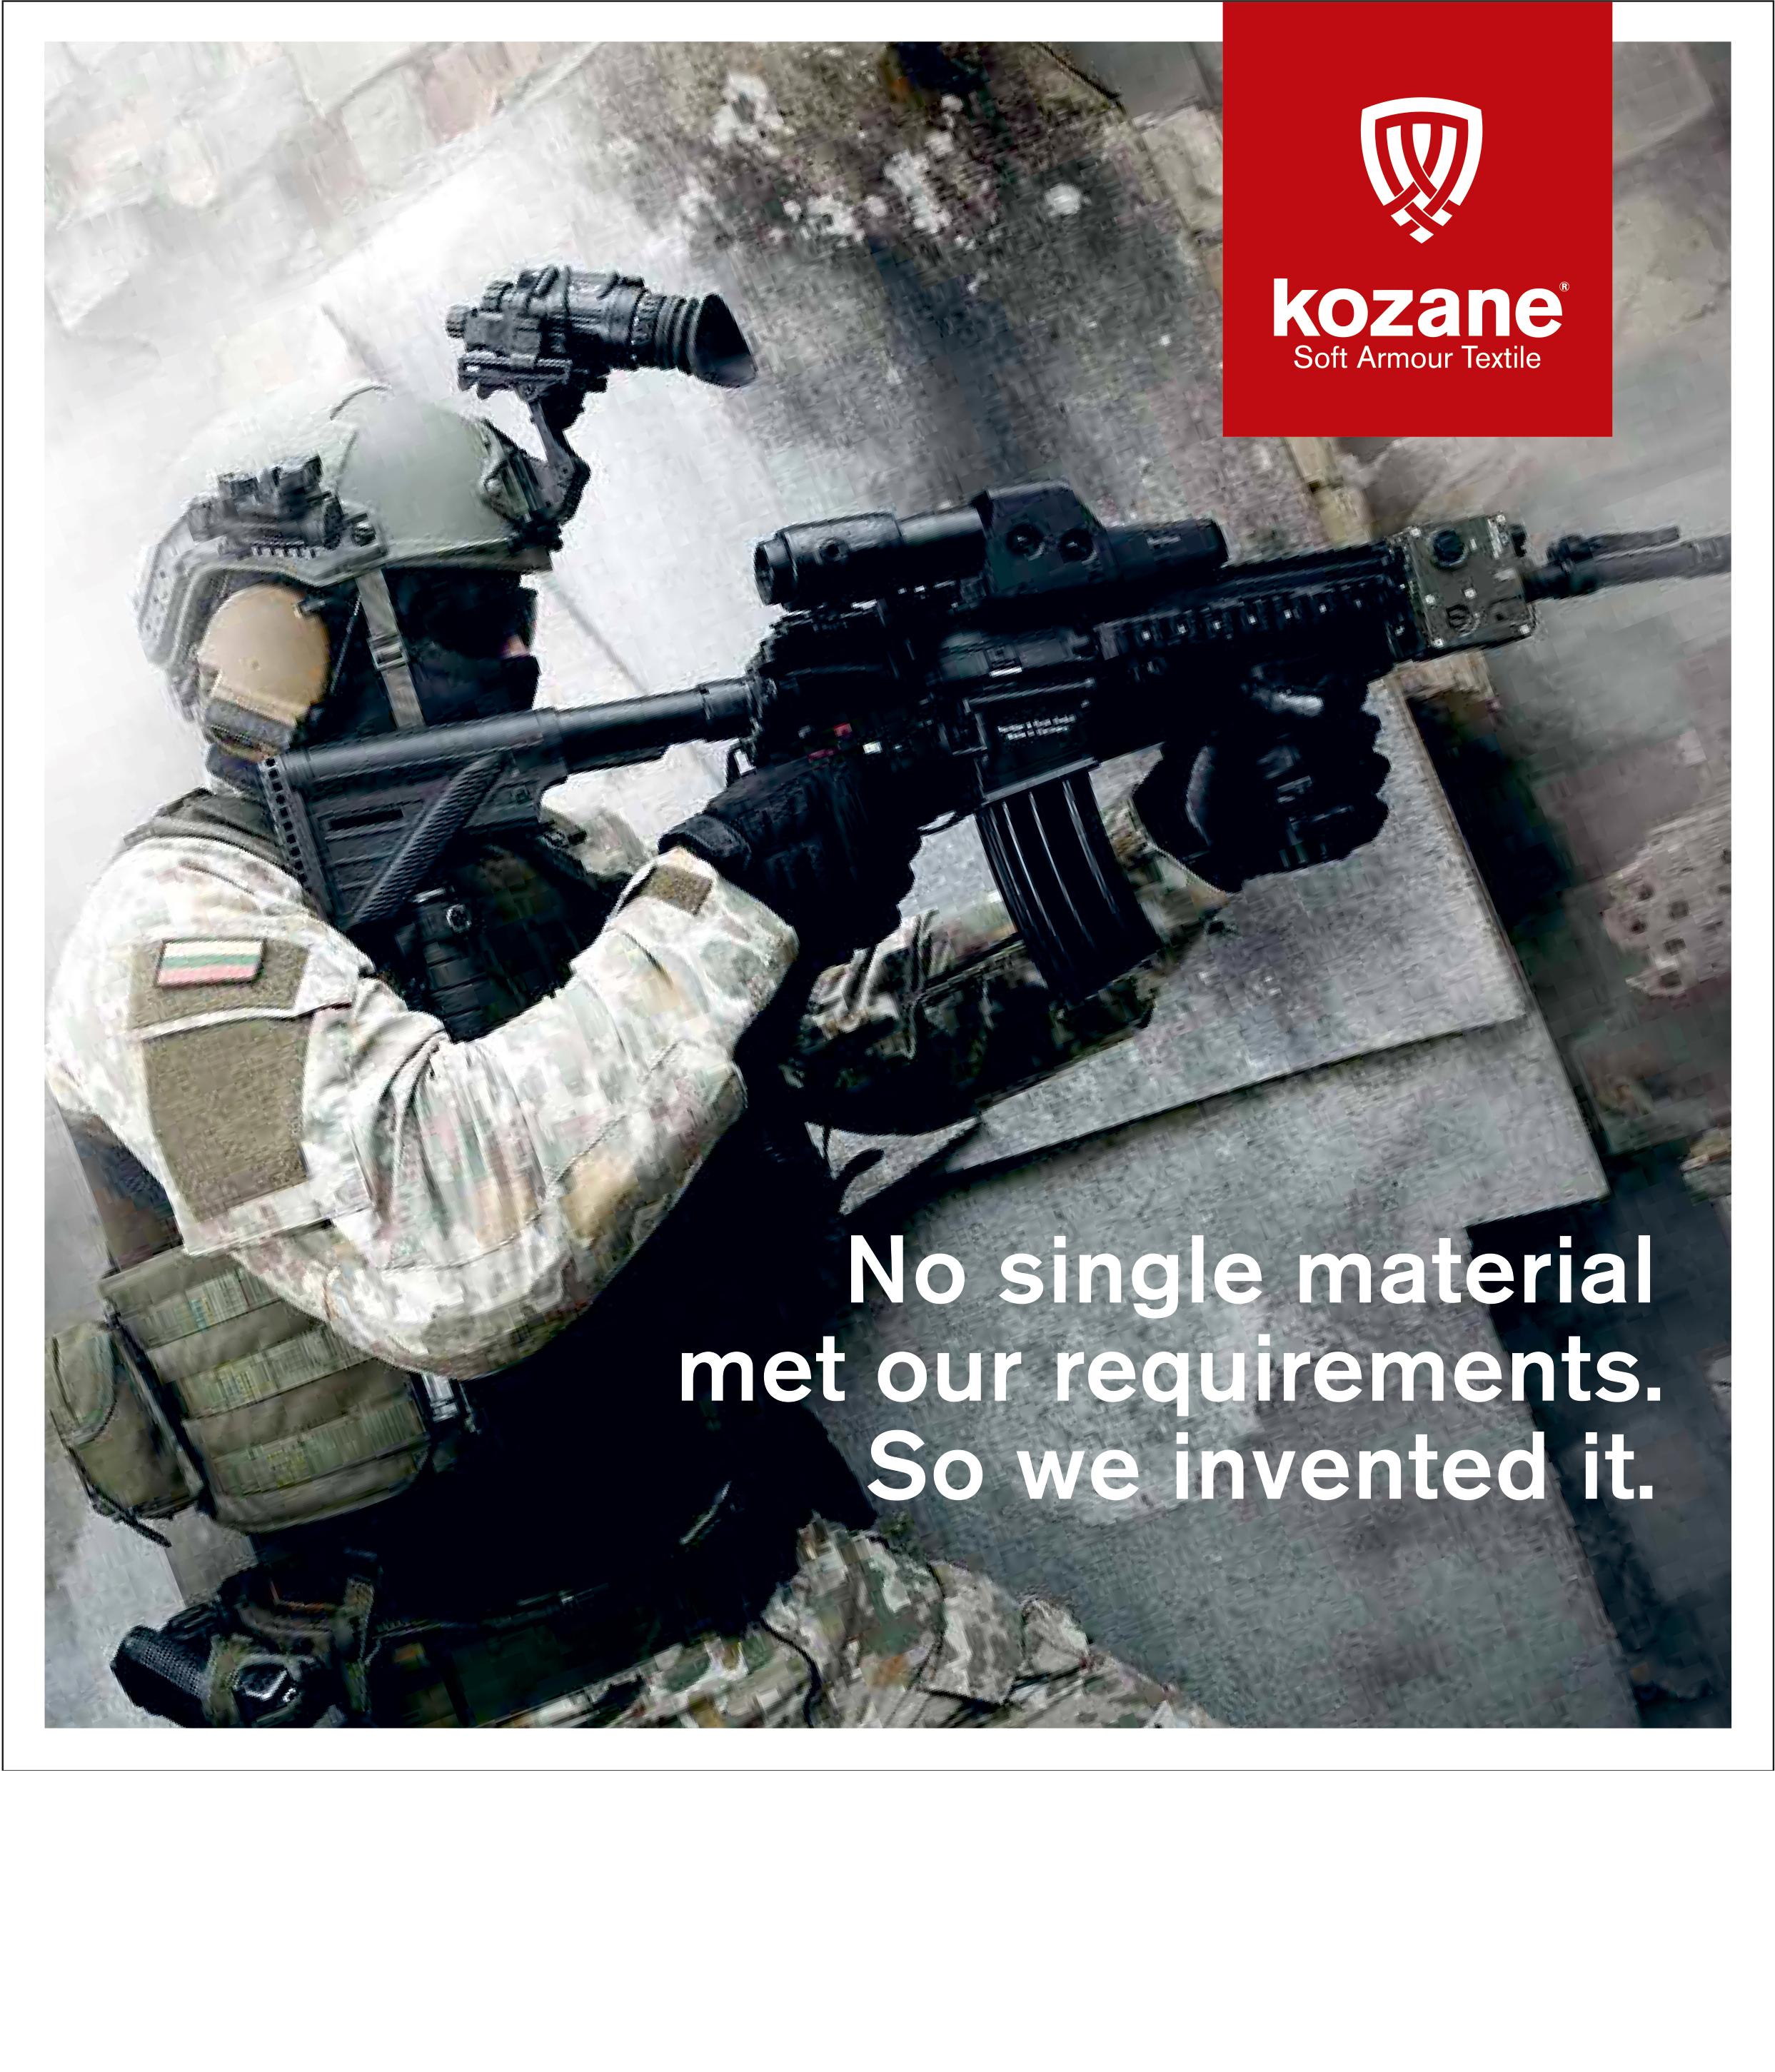 Kozane catalogue cover